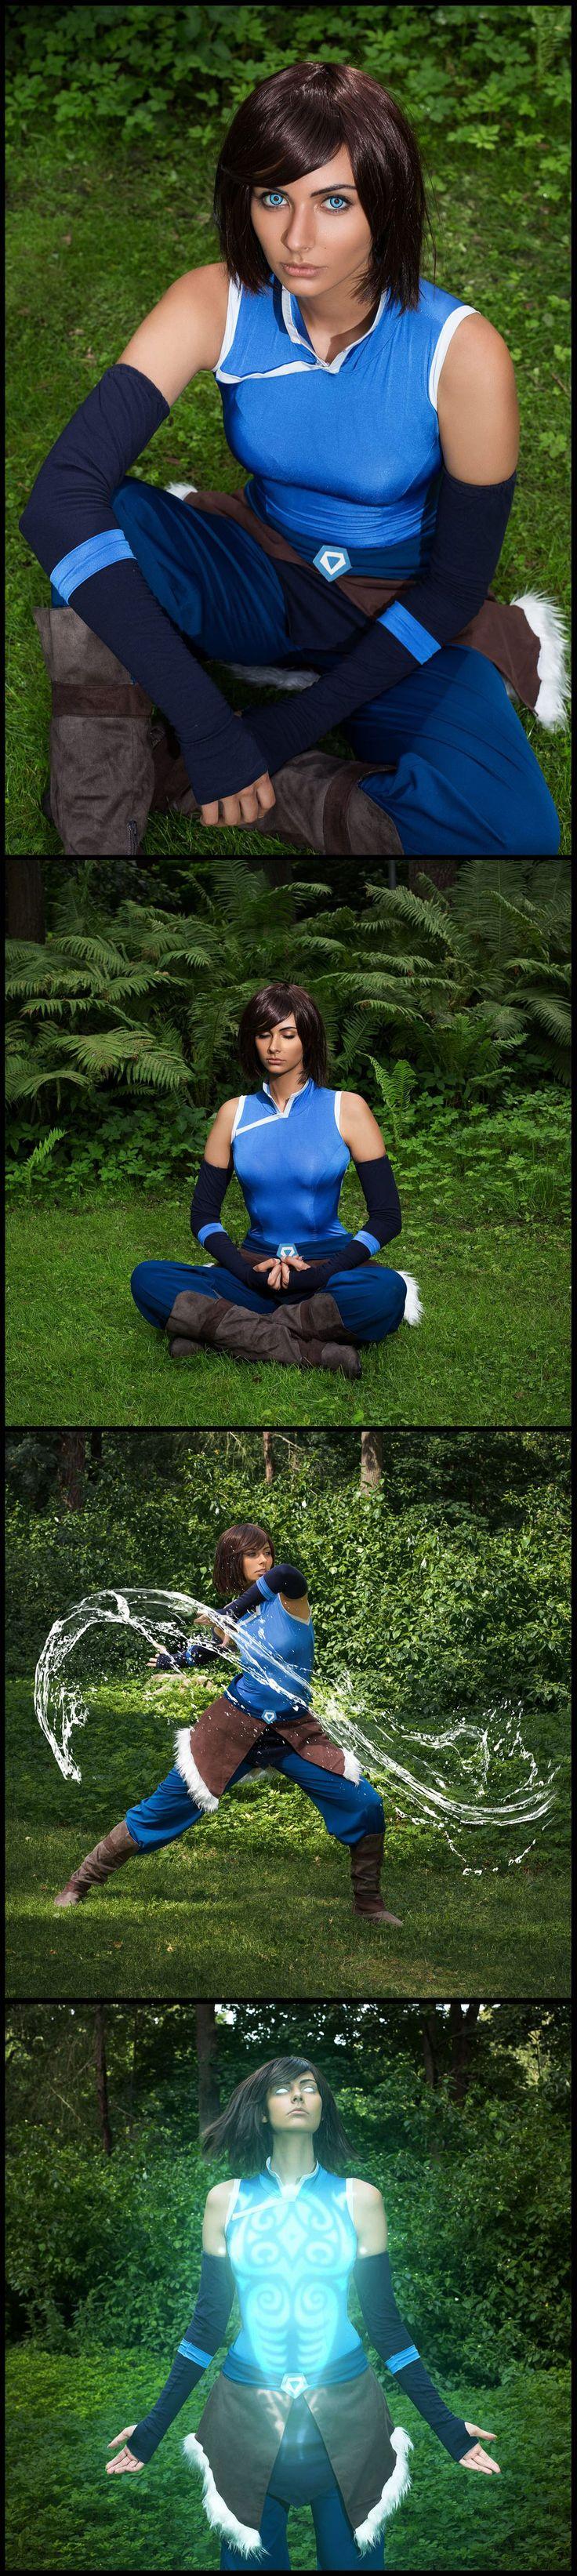 Avatar Korra by Russian Cosplayer @AnnetBlueWolf